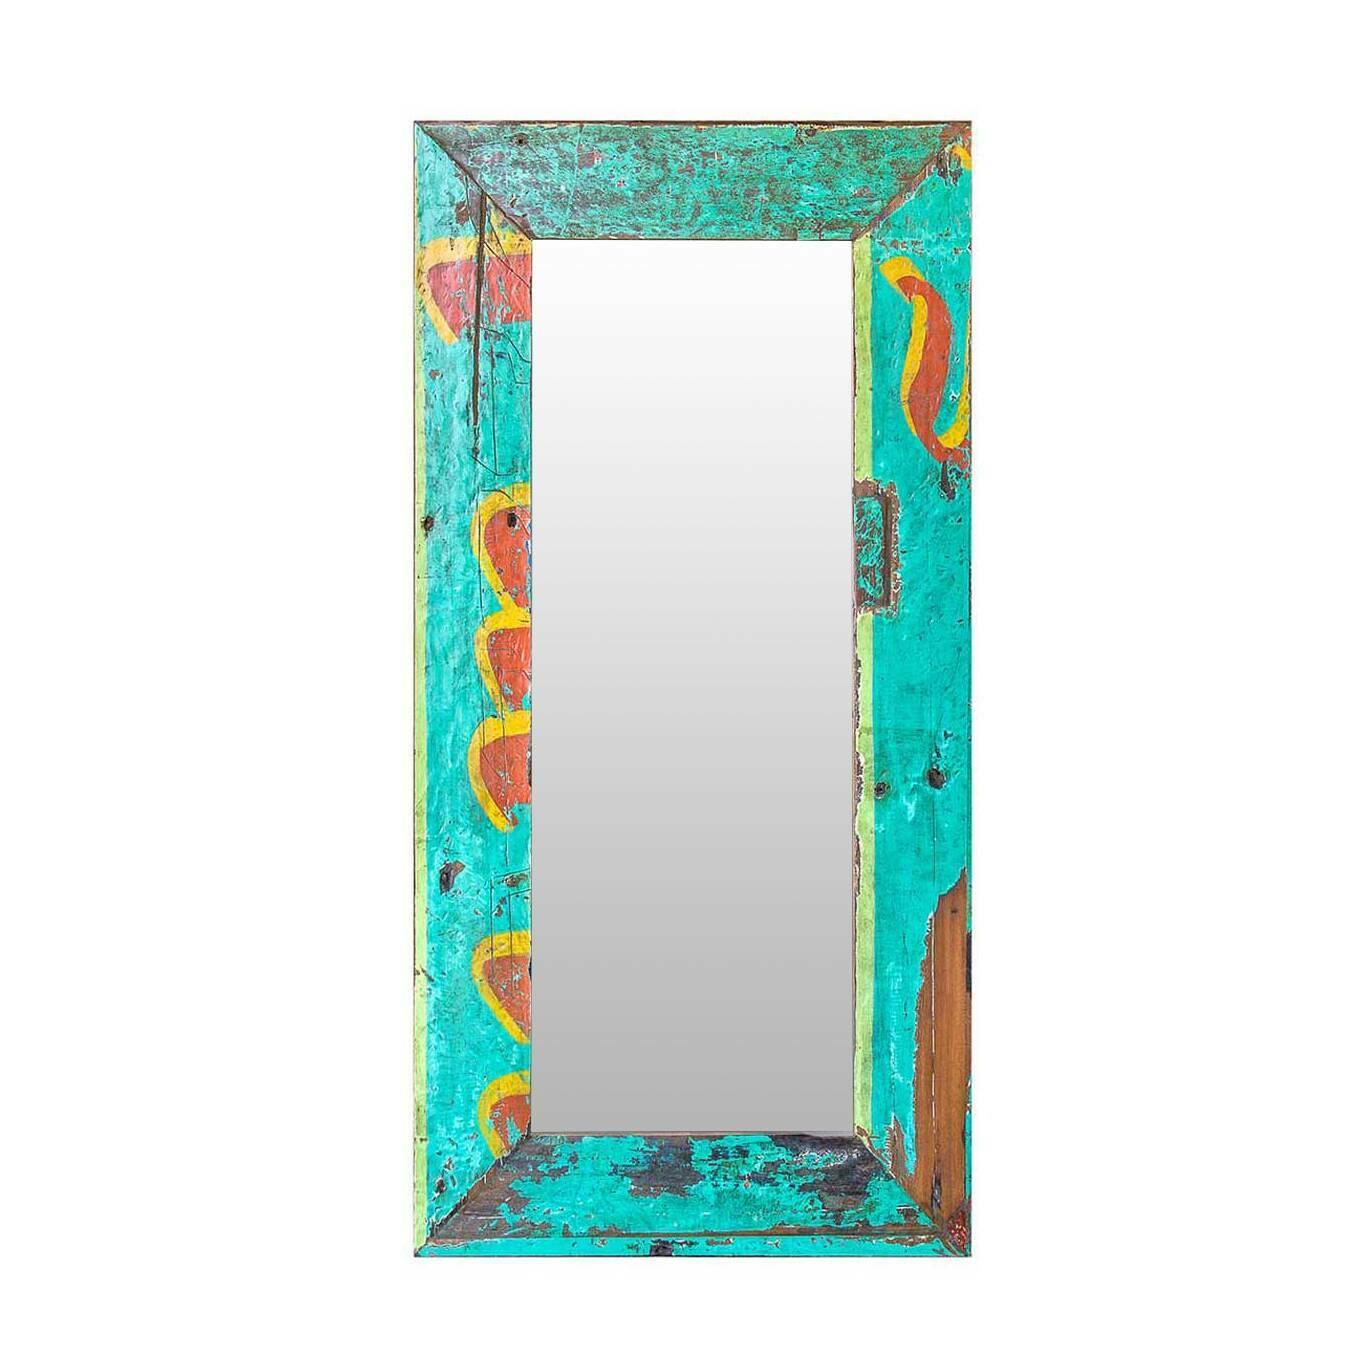 Зеркало Like Lodka 15576101 от Cosmorelax